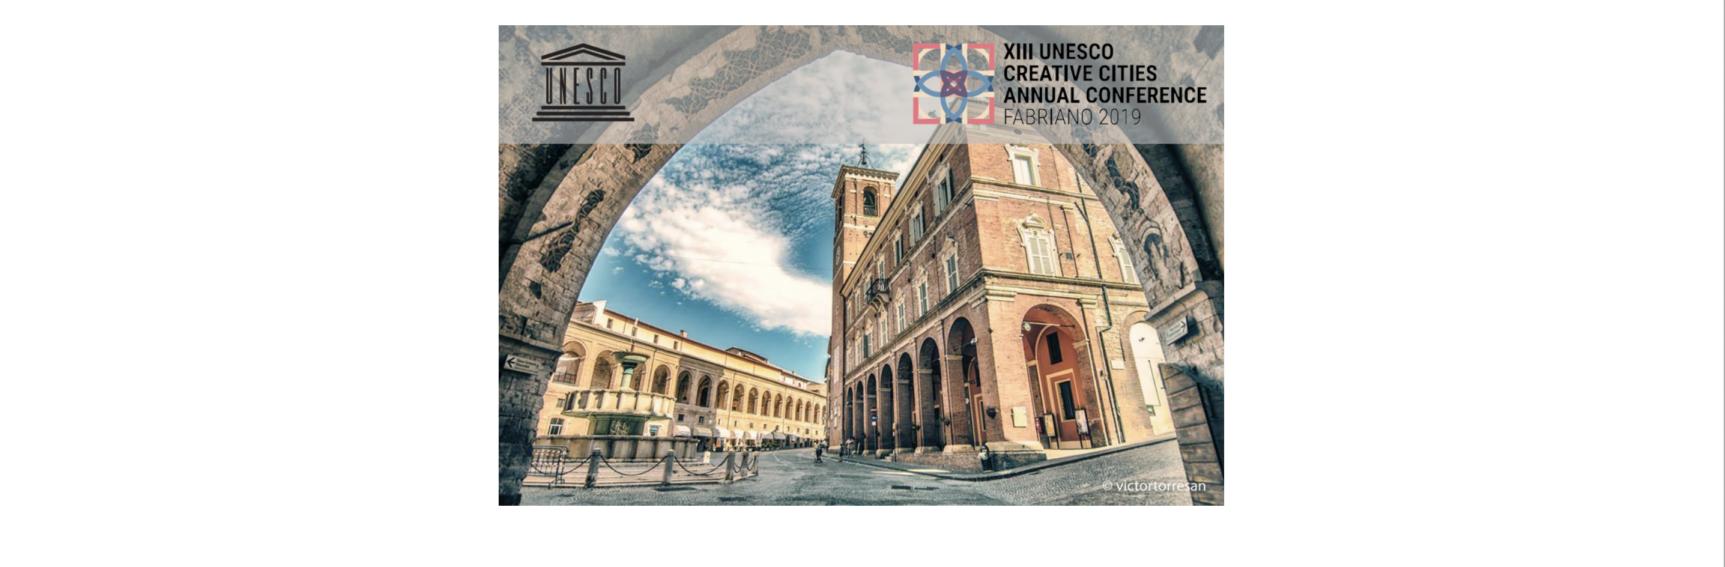 Montréal uitnodiging UNESCO